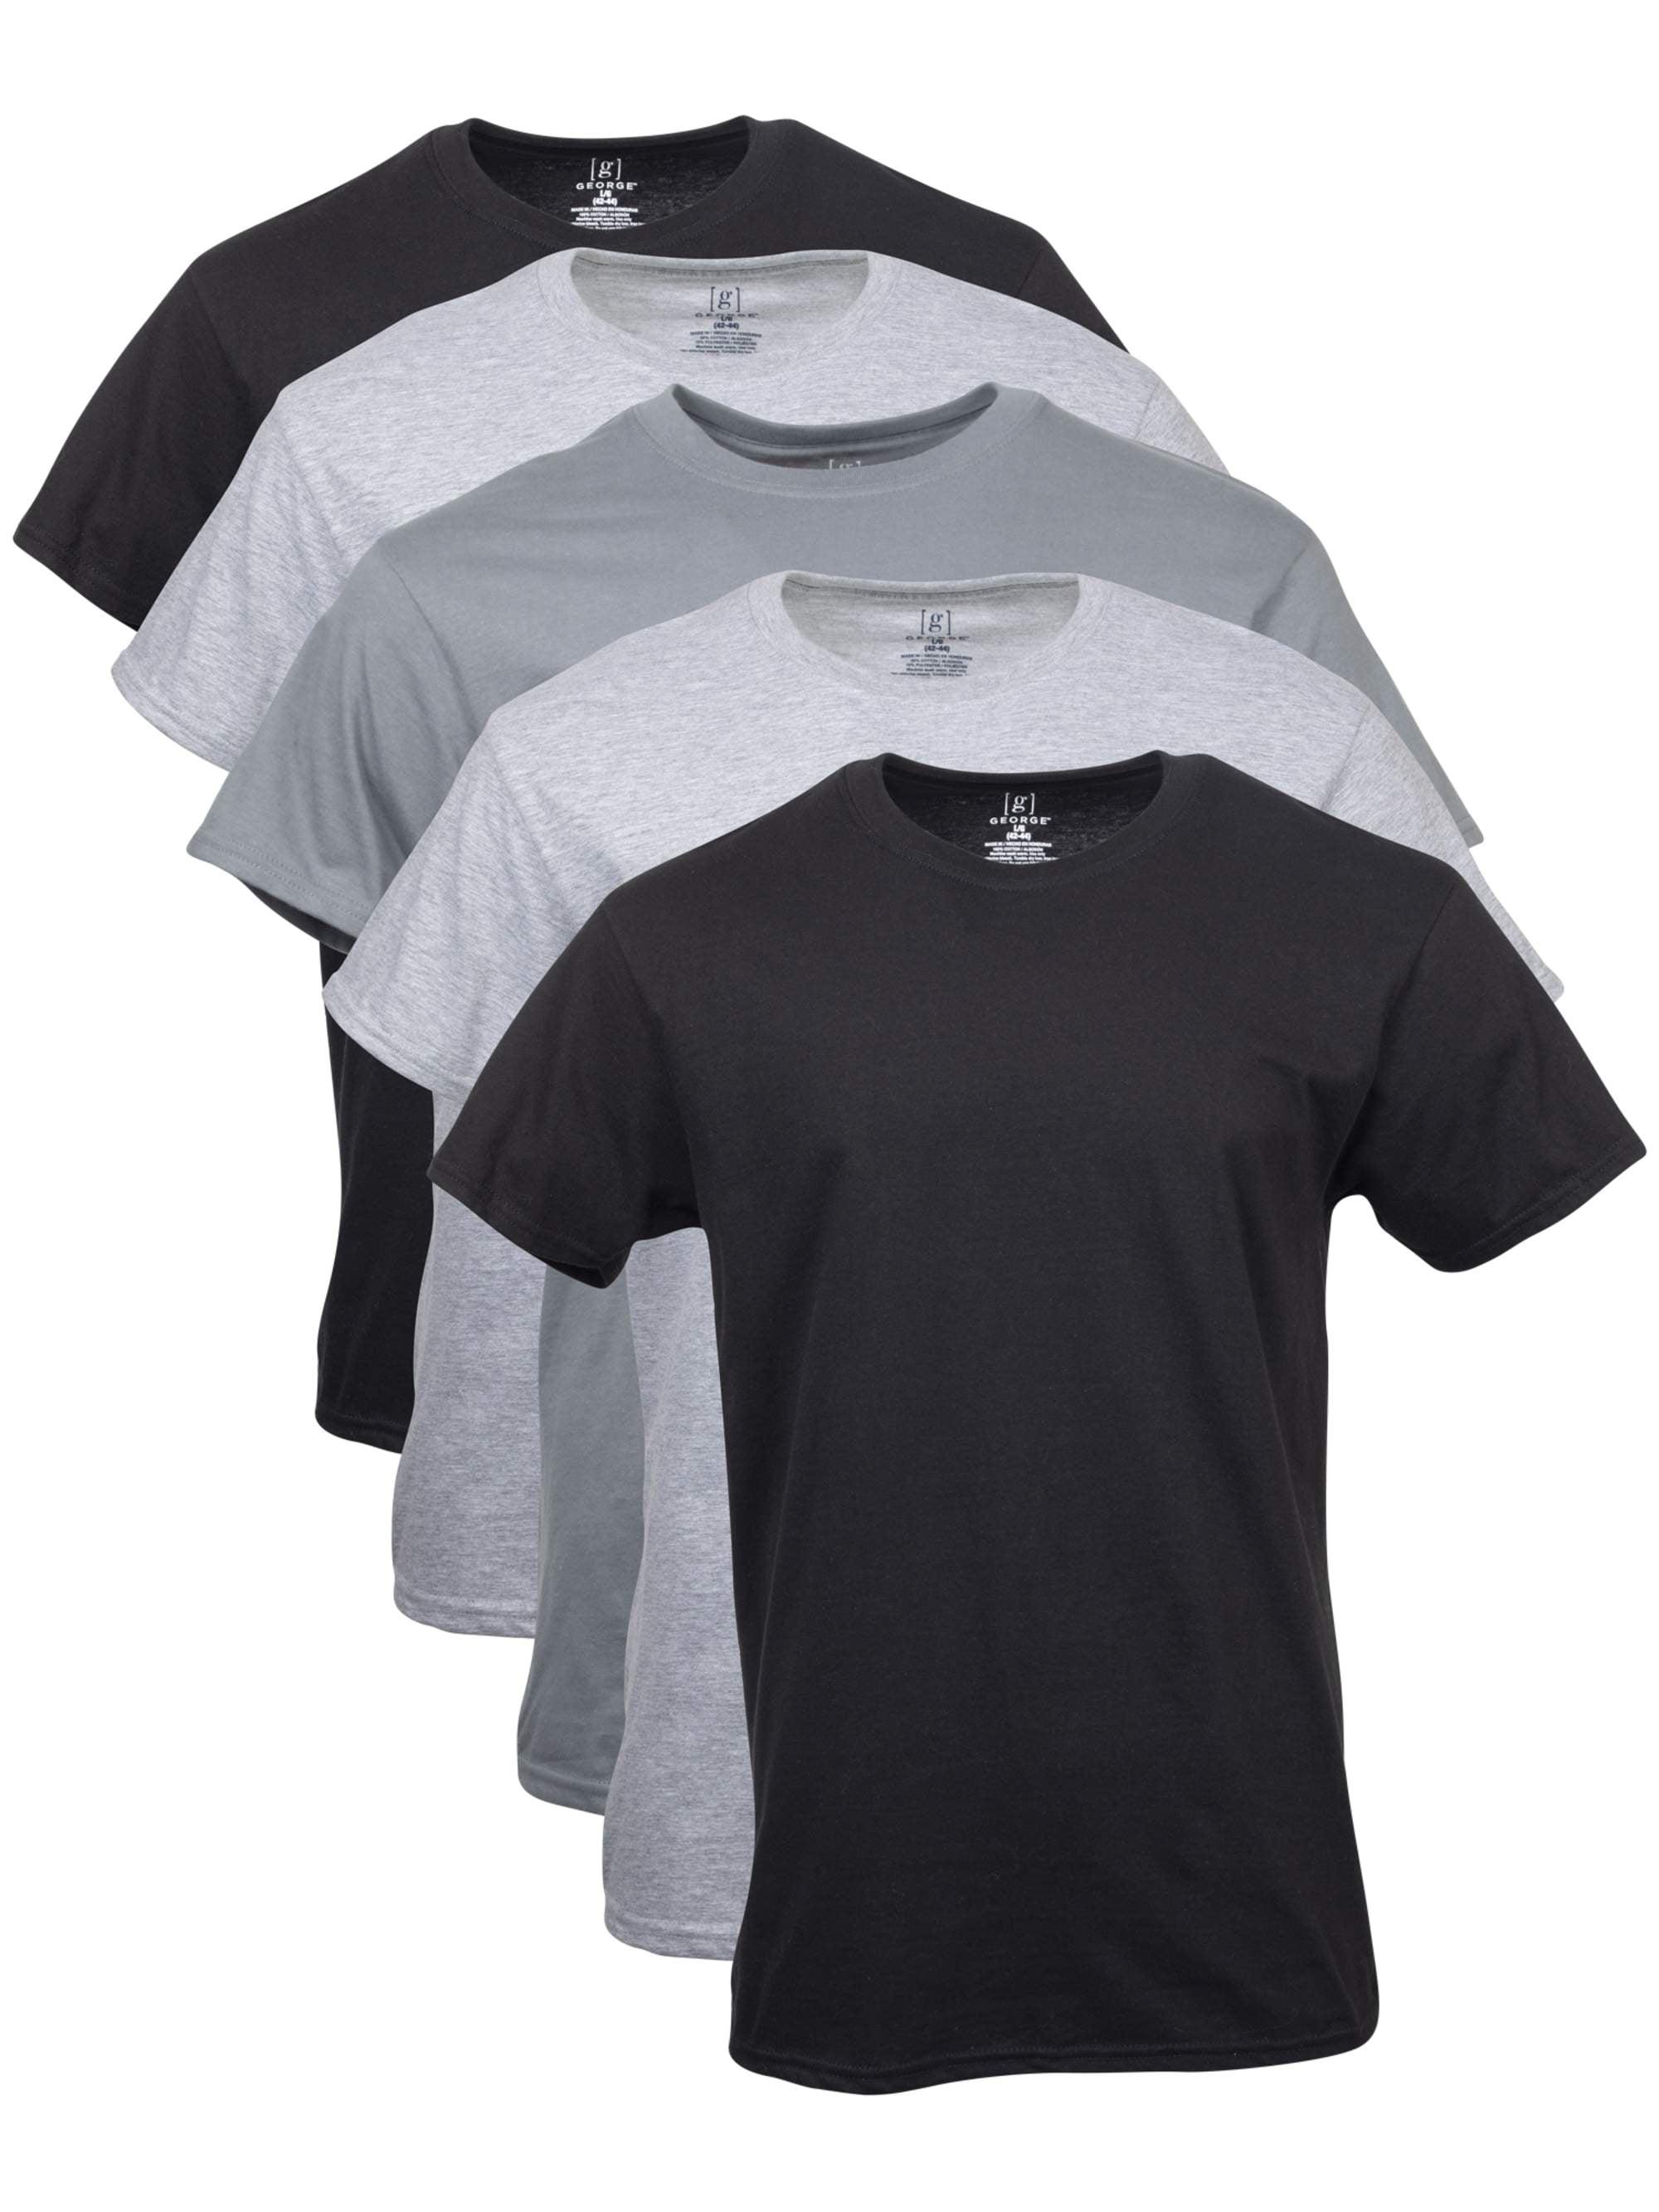 George Men's Crew T-Shirts, 5-Pack